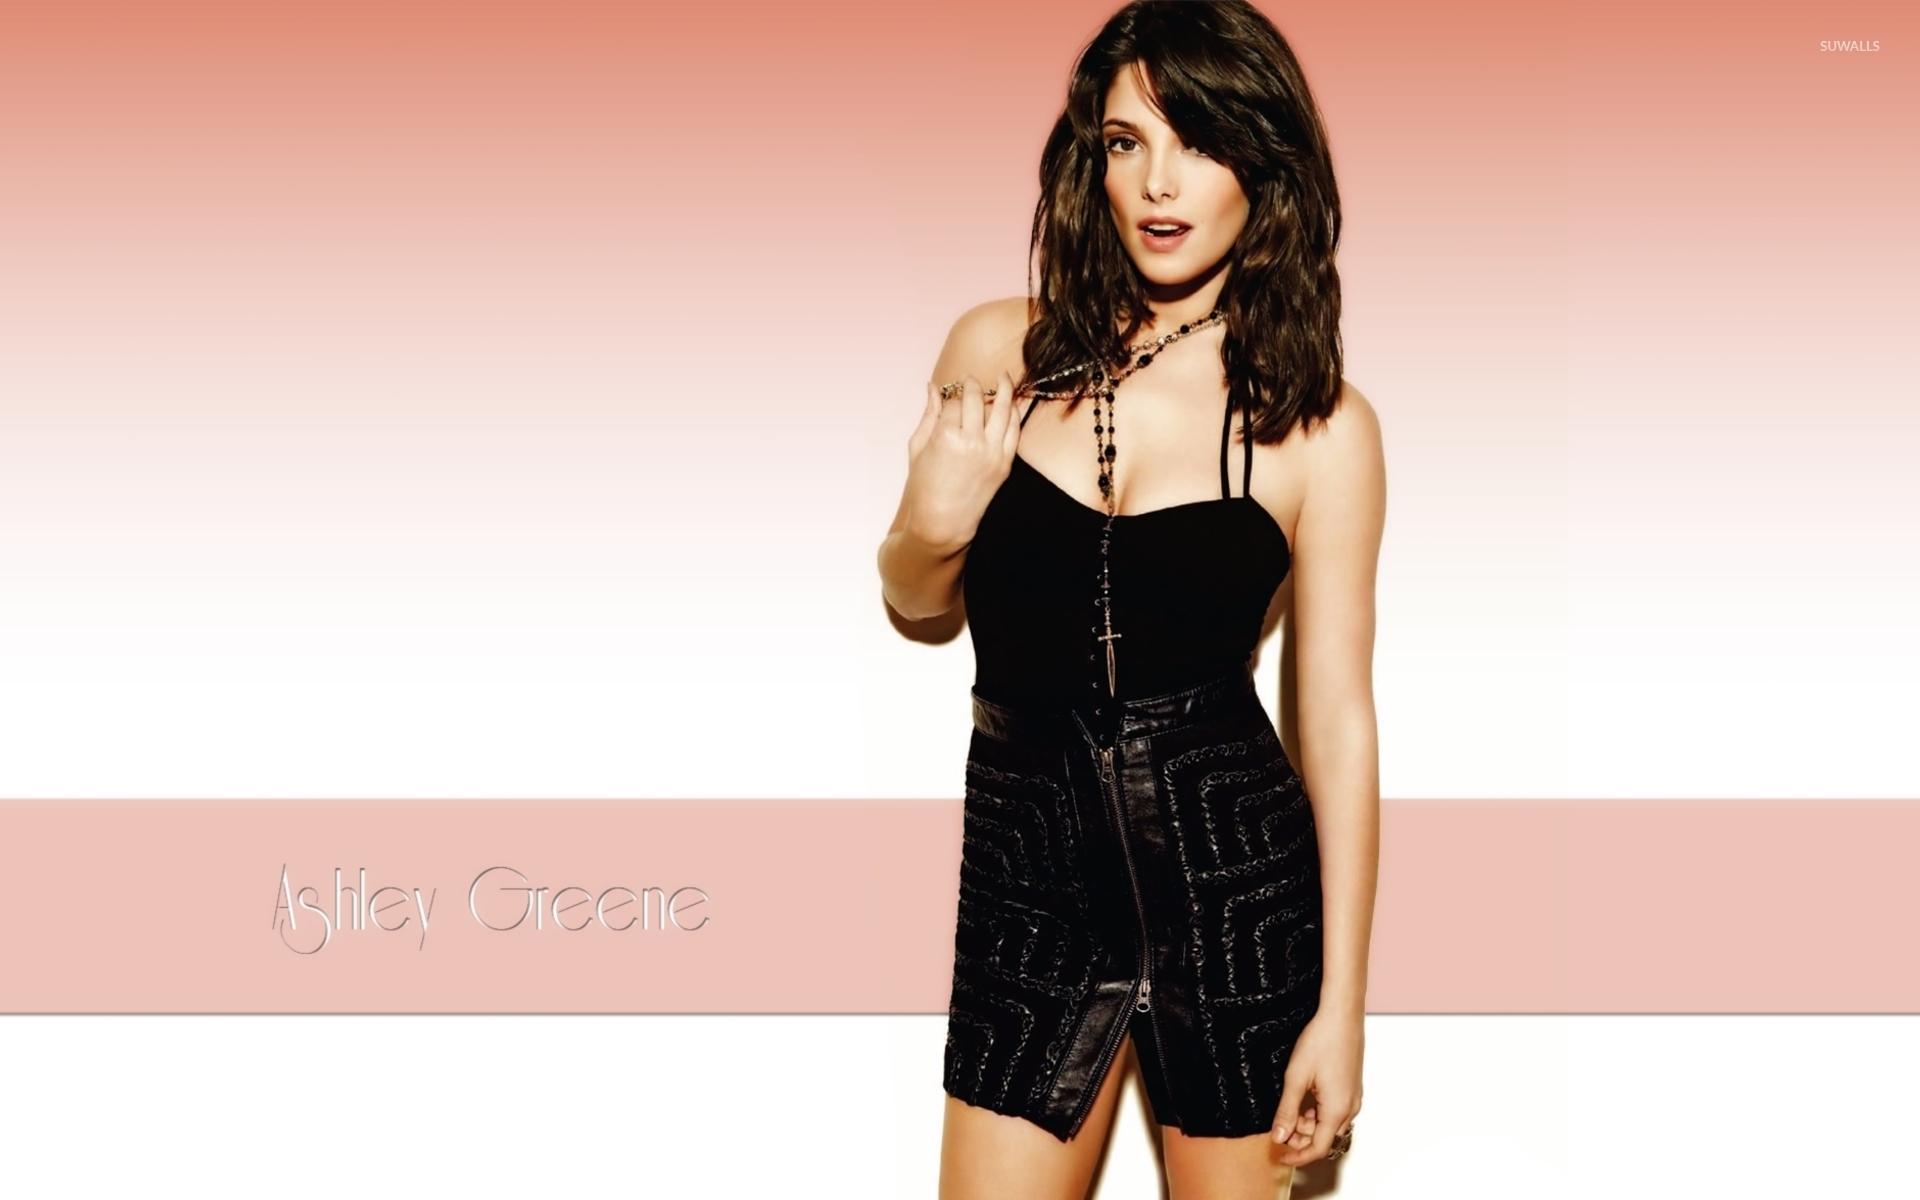 Star Celebrity Wallpapers Ashley Greene Hd Wallpapers: Ashley Greene [12] Wallpaper